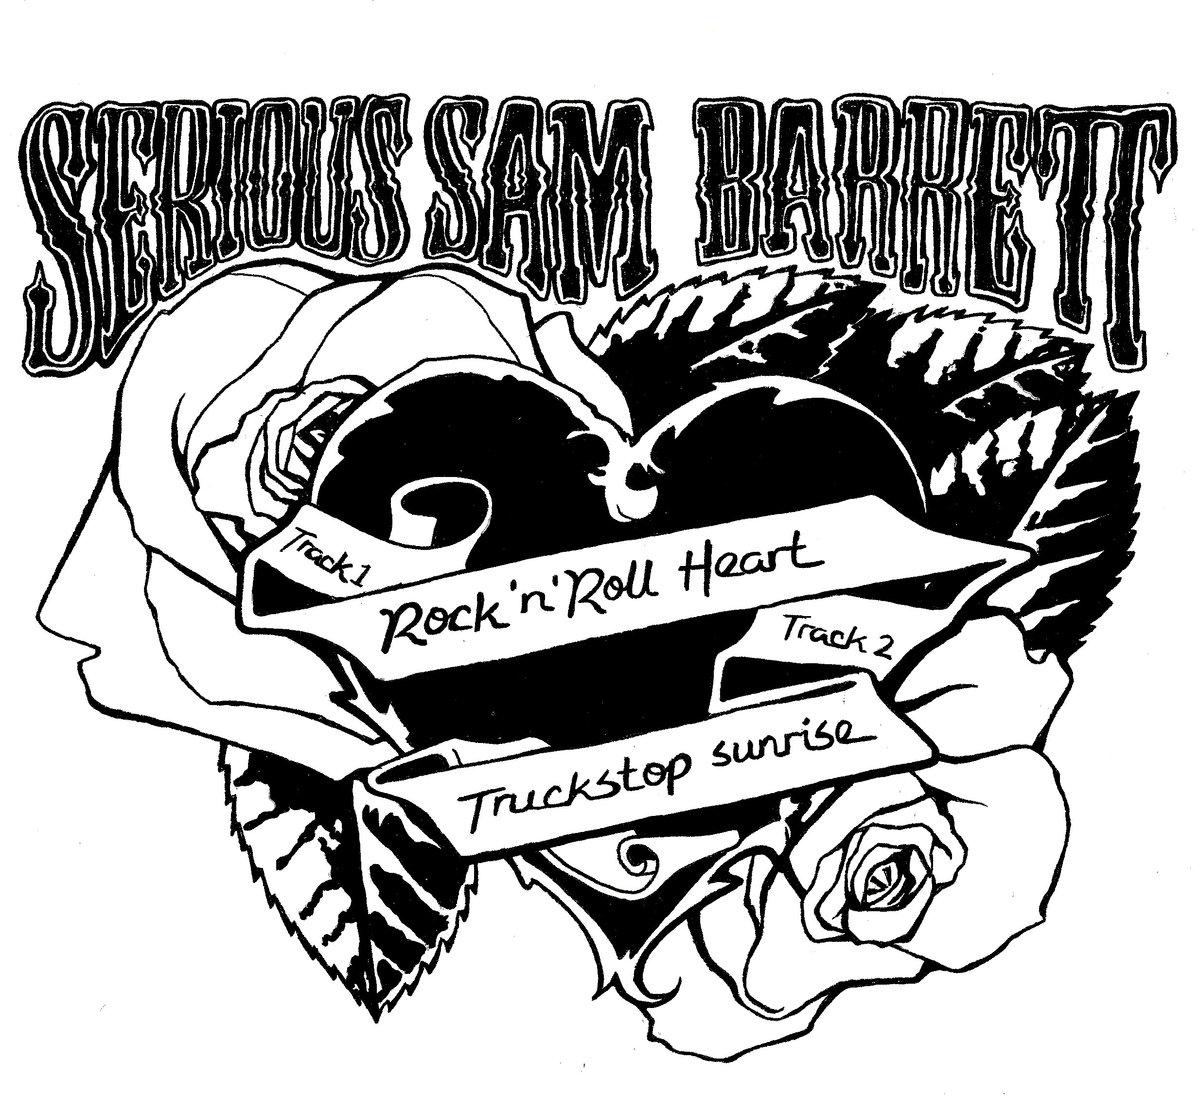 1200x1096 Rock N' Roll Heart Serious Sam Barrett (Yadig Records)